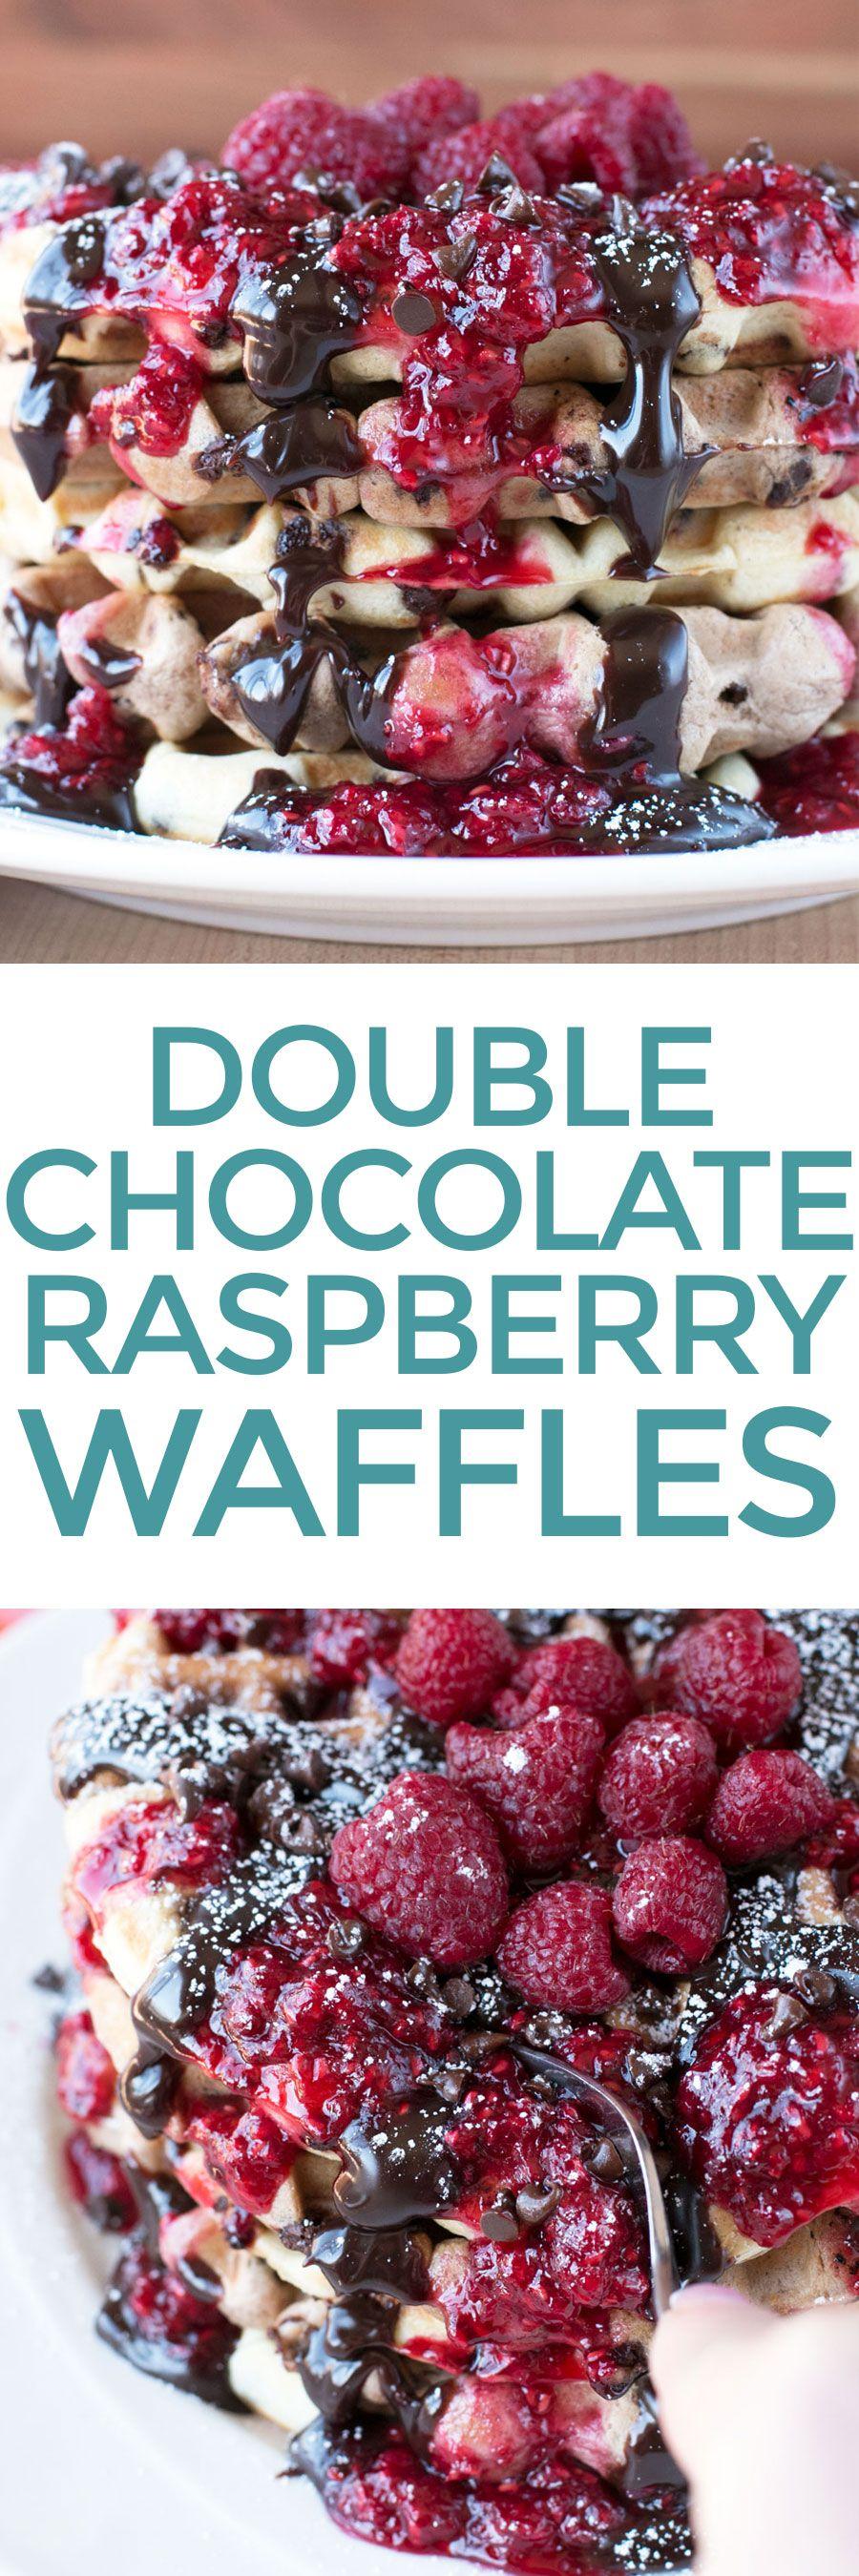 Double chocolate chip raspberry waffles recipe